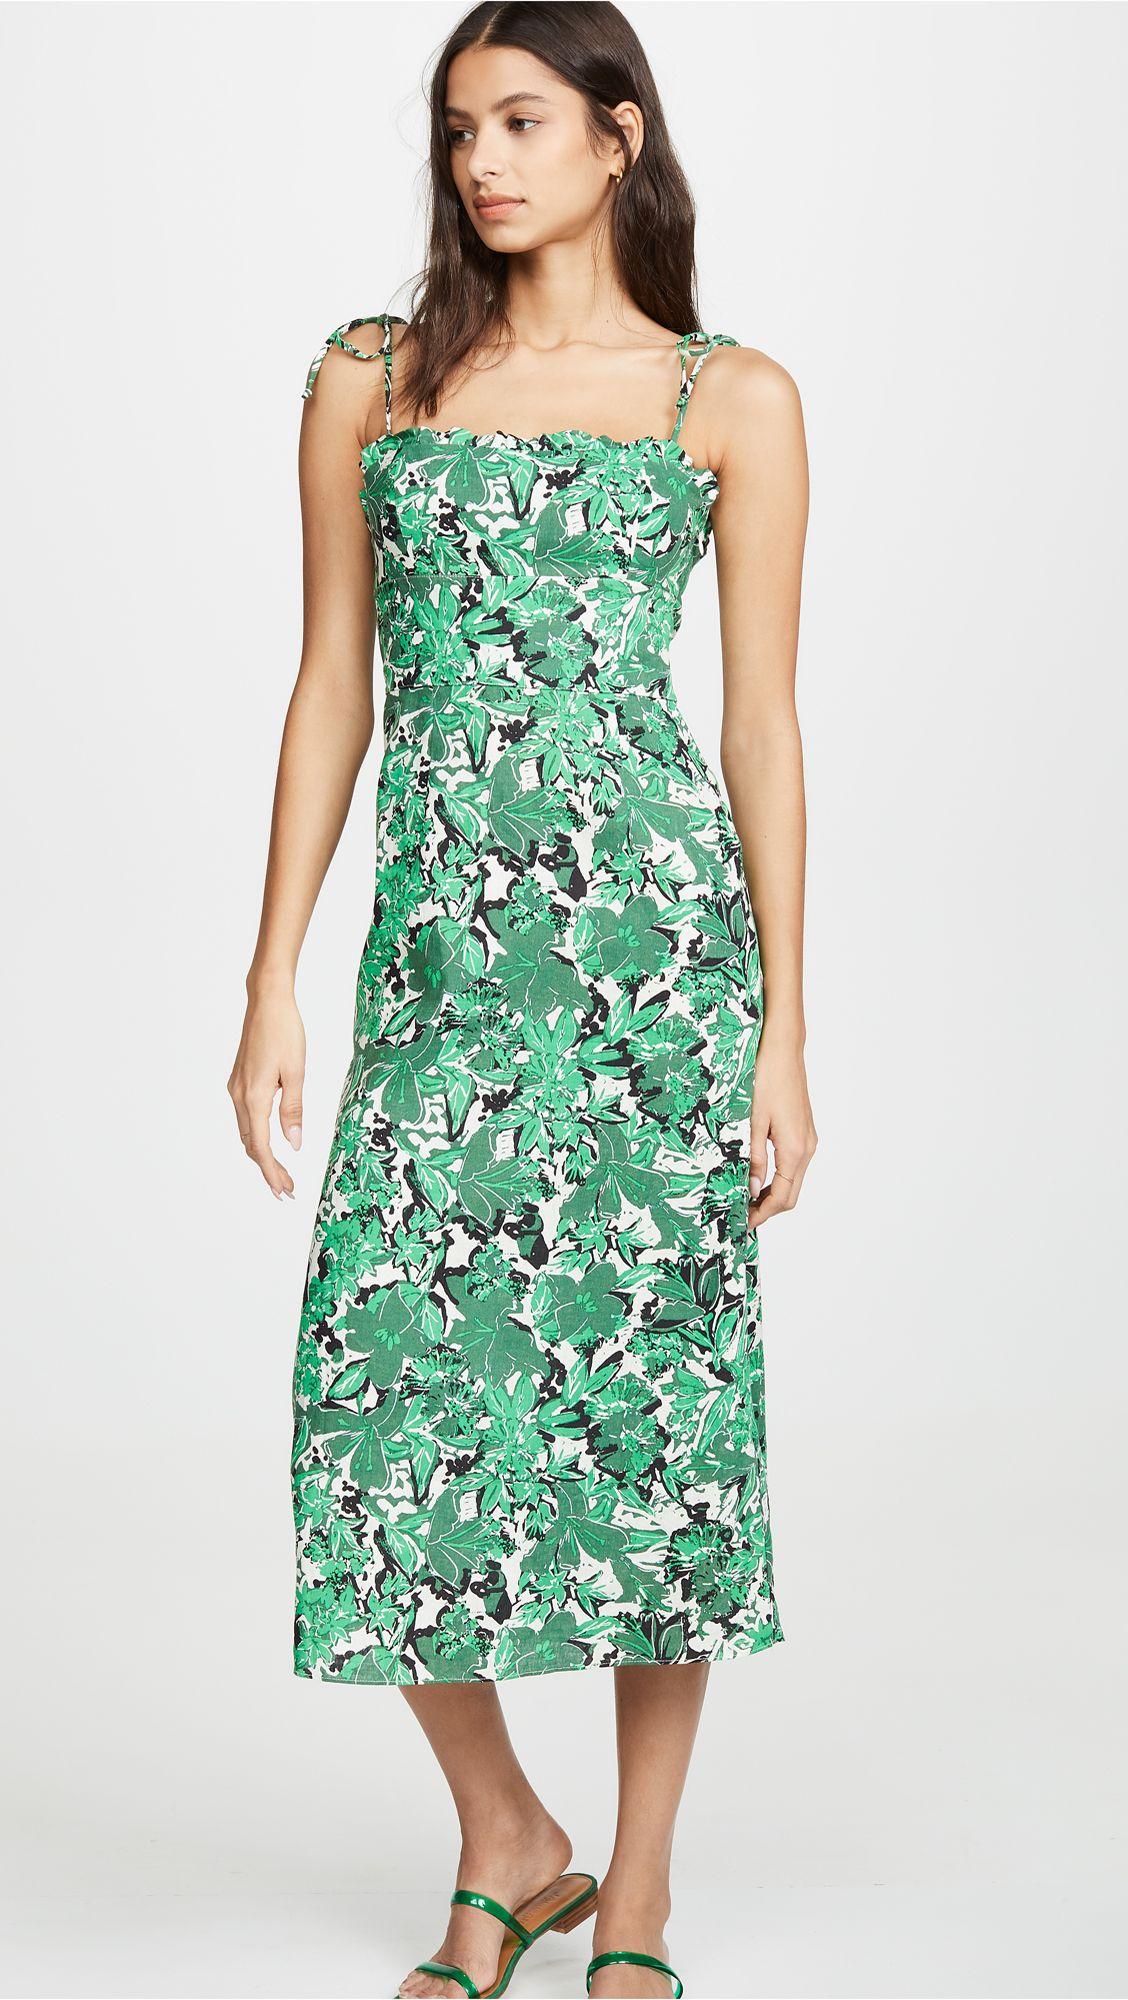 32+ Cinq a sept sydney dress trends